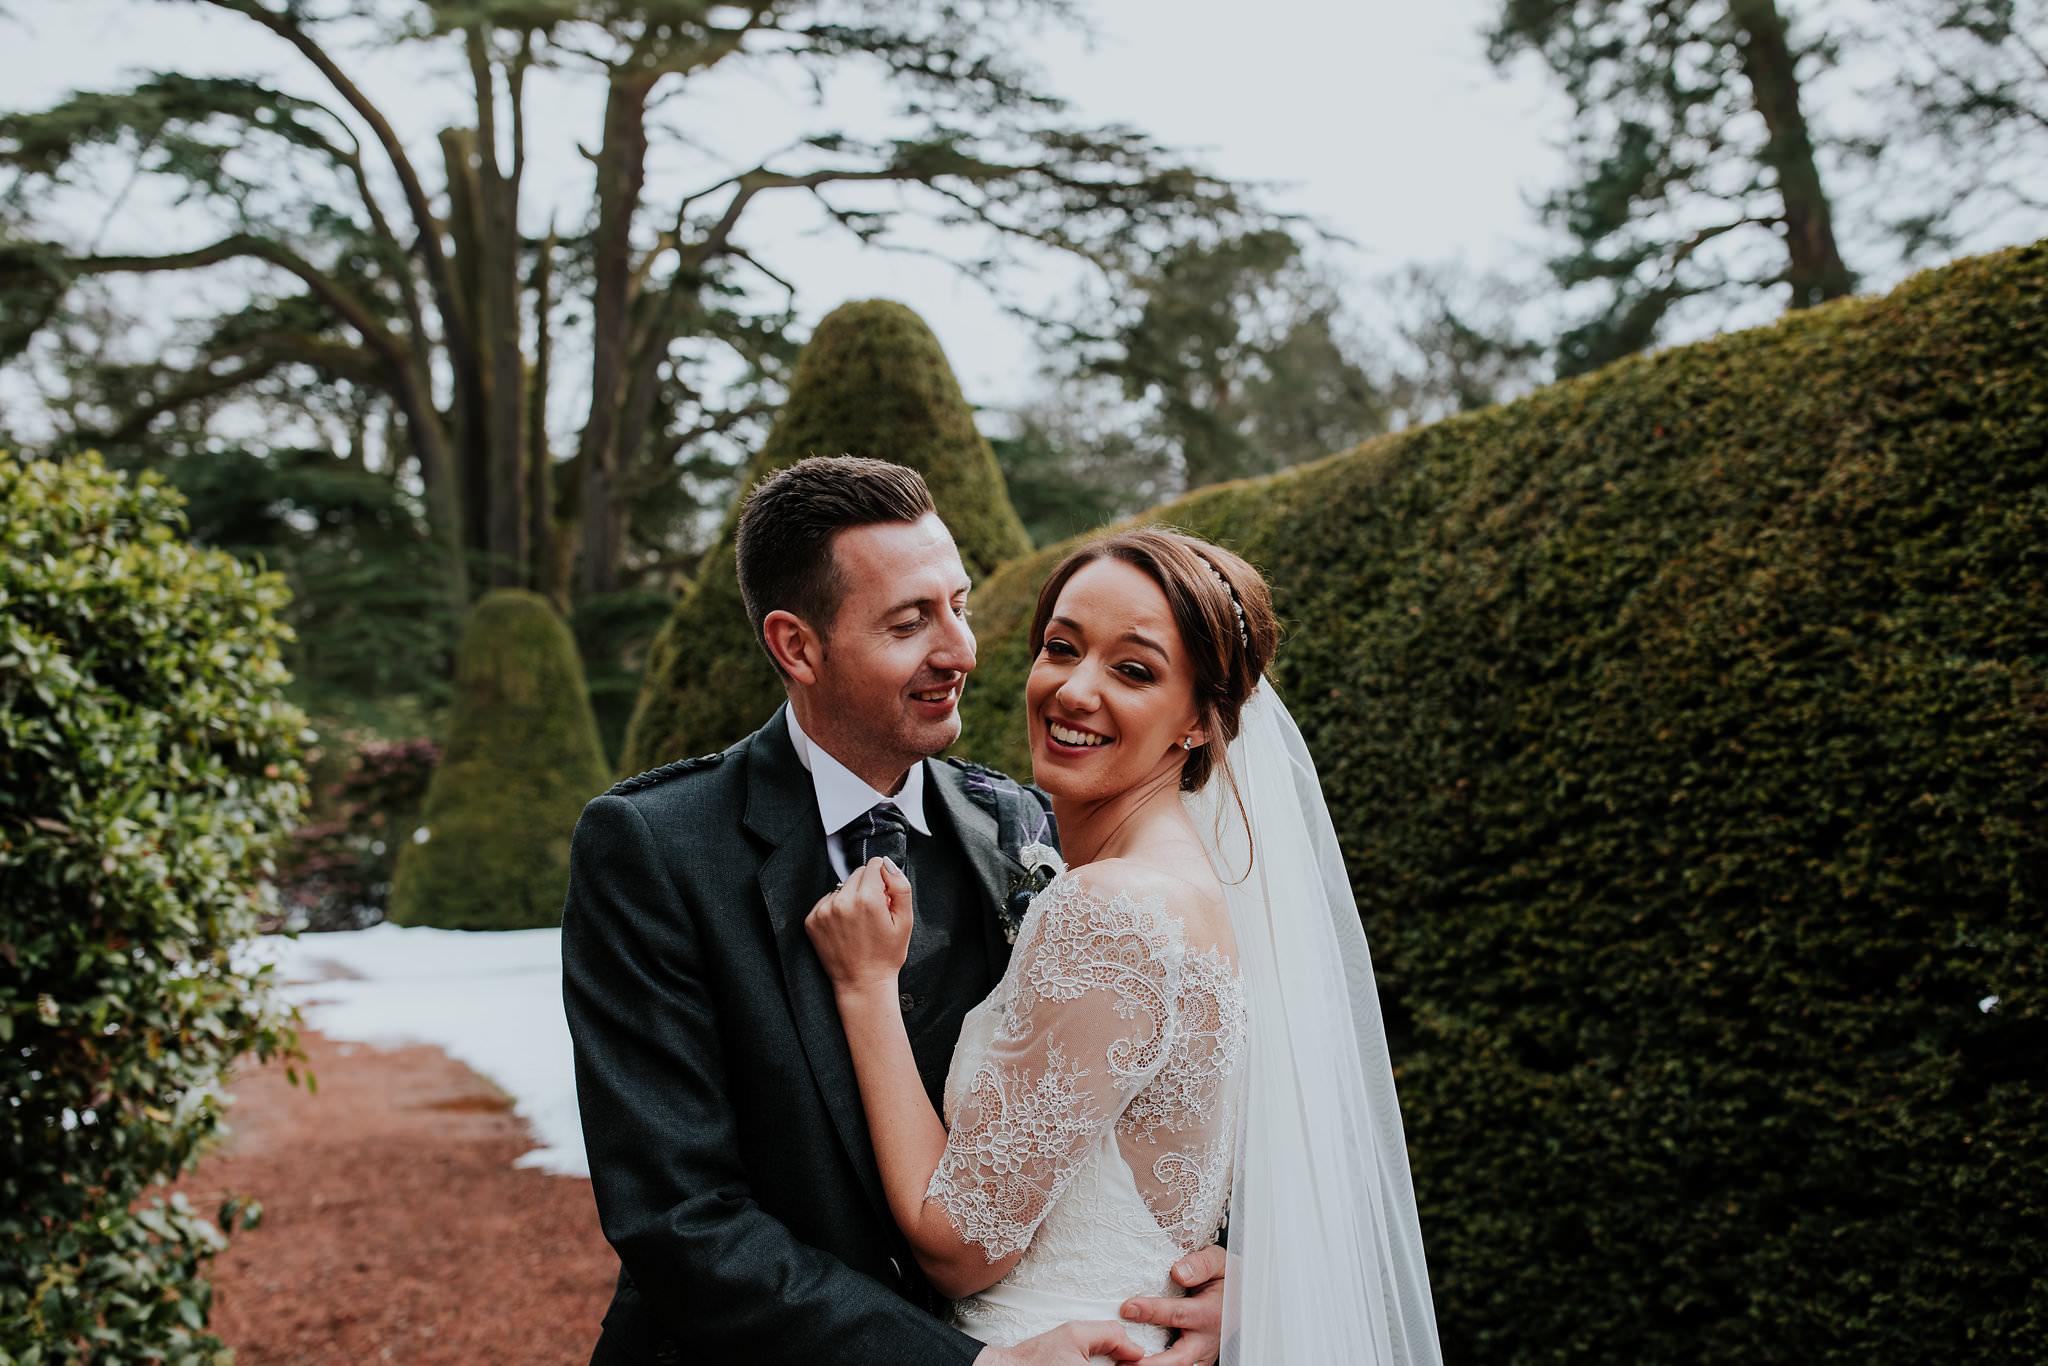 kirknewton stables wedding photographer (51).jpg